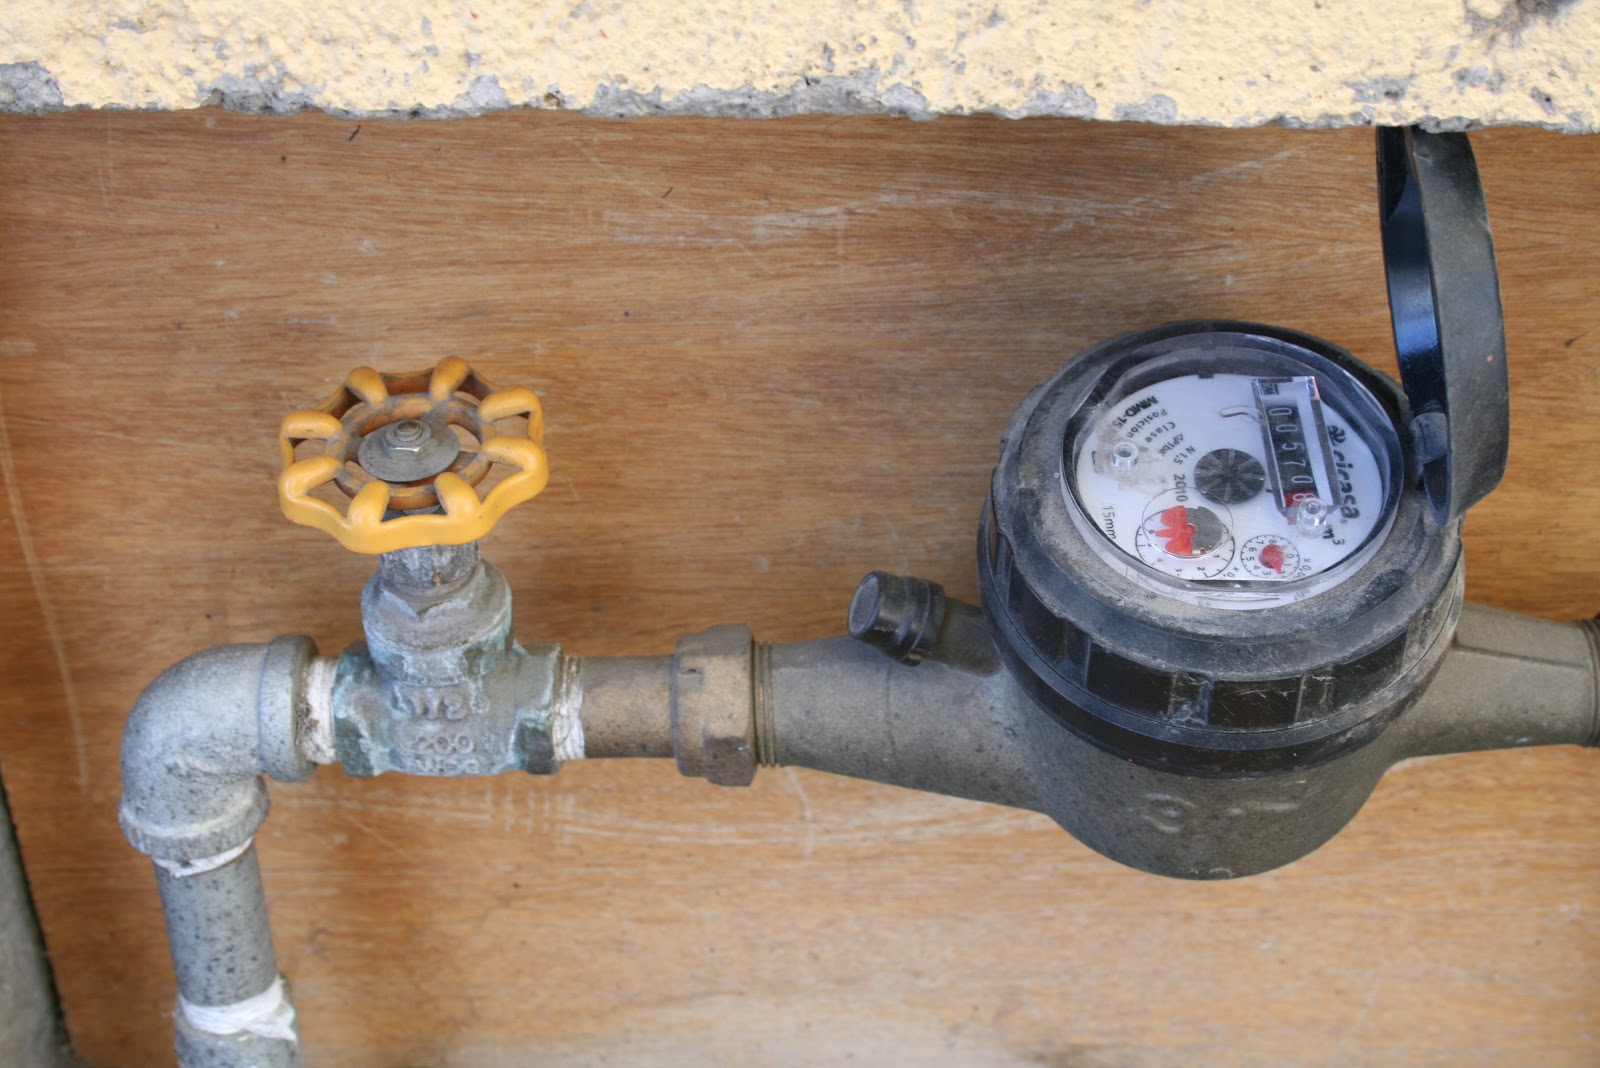 Continuamosmx multar n por tomas clandestinas de agua en for Toma de agua